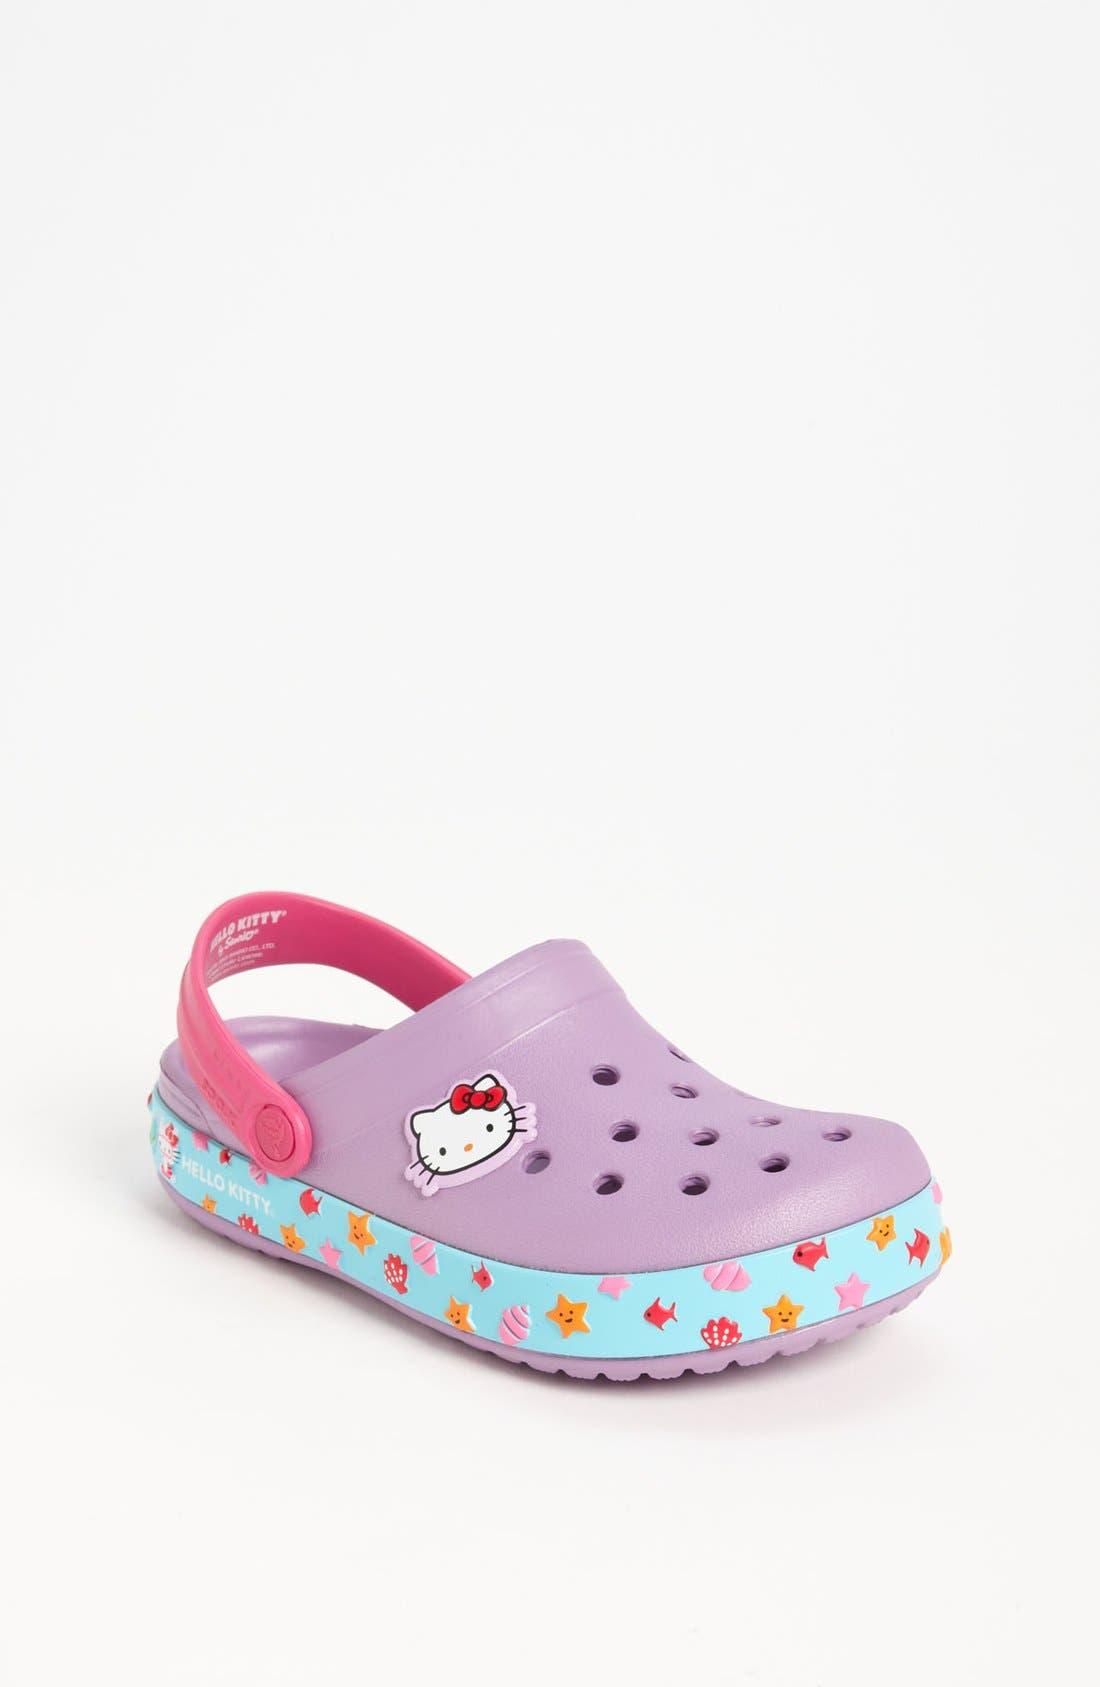 Main Image - CROCS™ 'Hello Kitty® - Mermaid' Slip-On (Walker & Toddler)